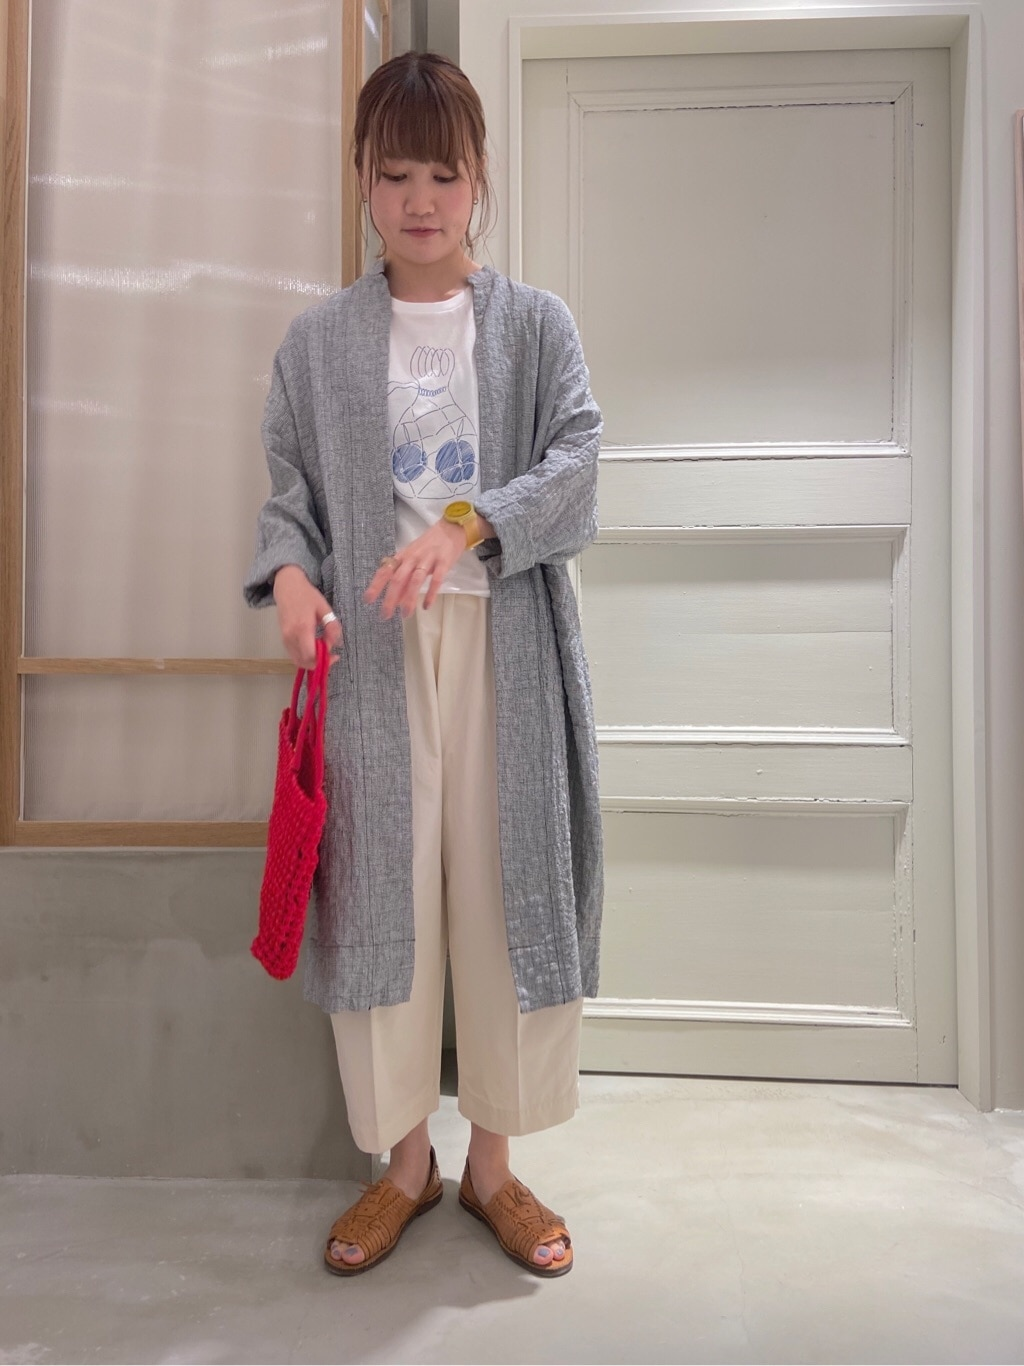 bulle de savon 渋谷スクランブルスクエア 身長:160cm 2020.06.11